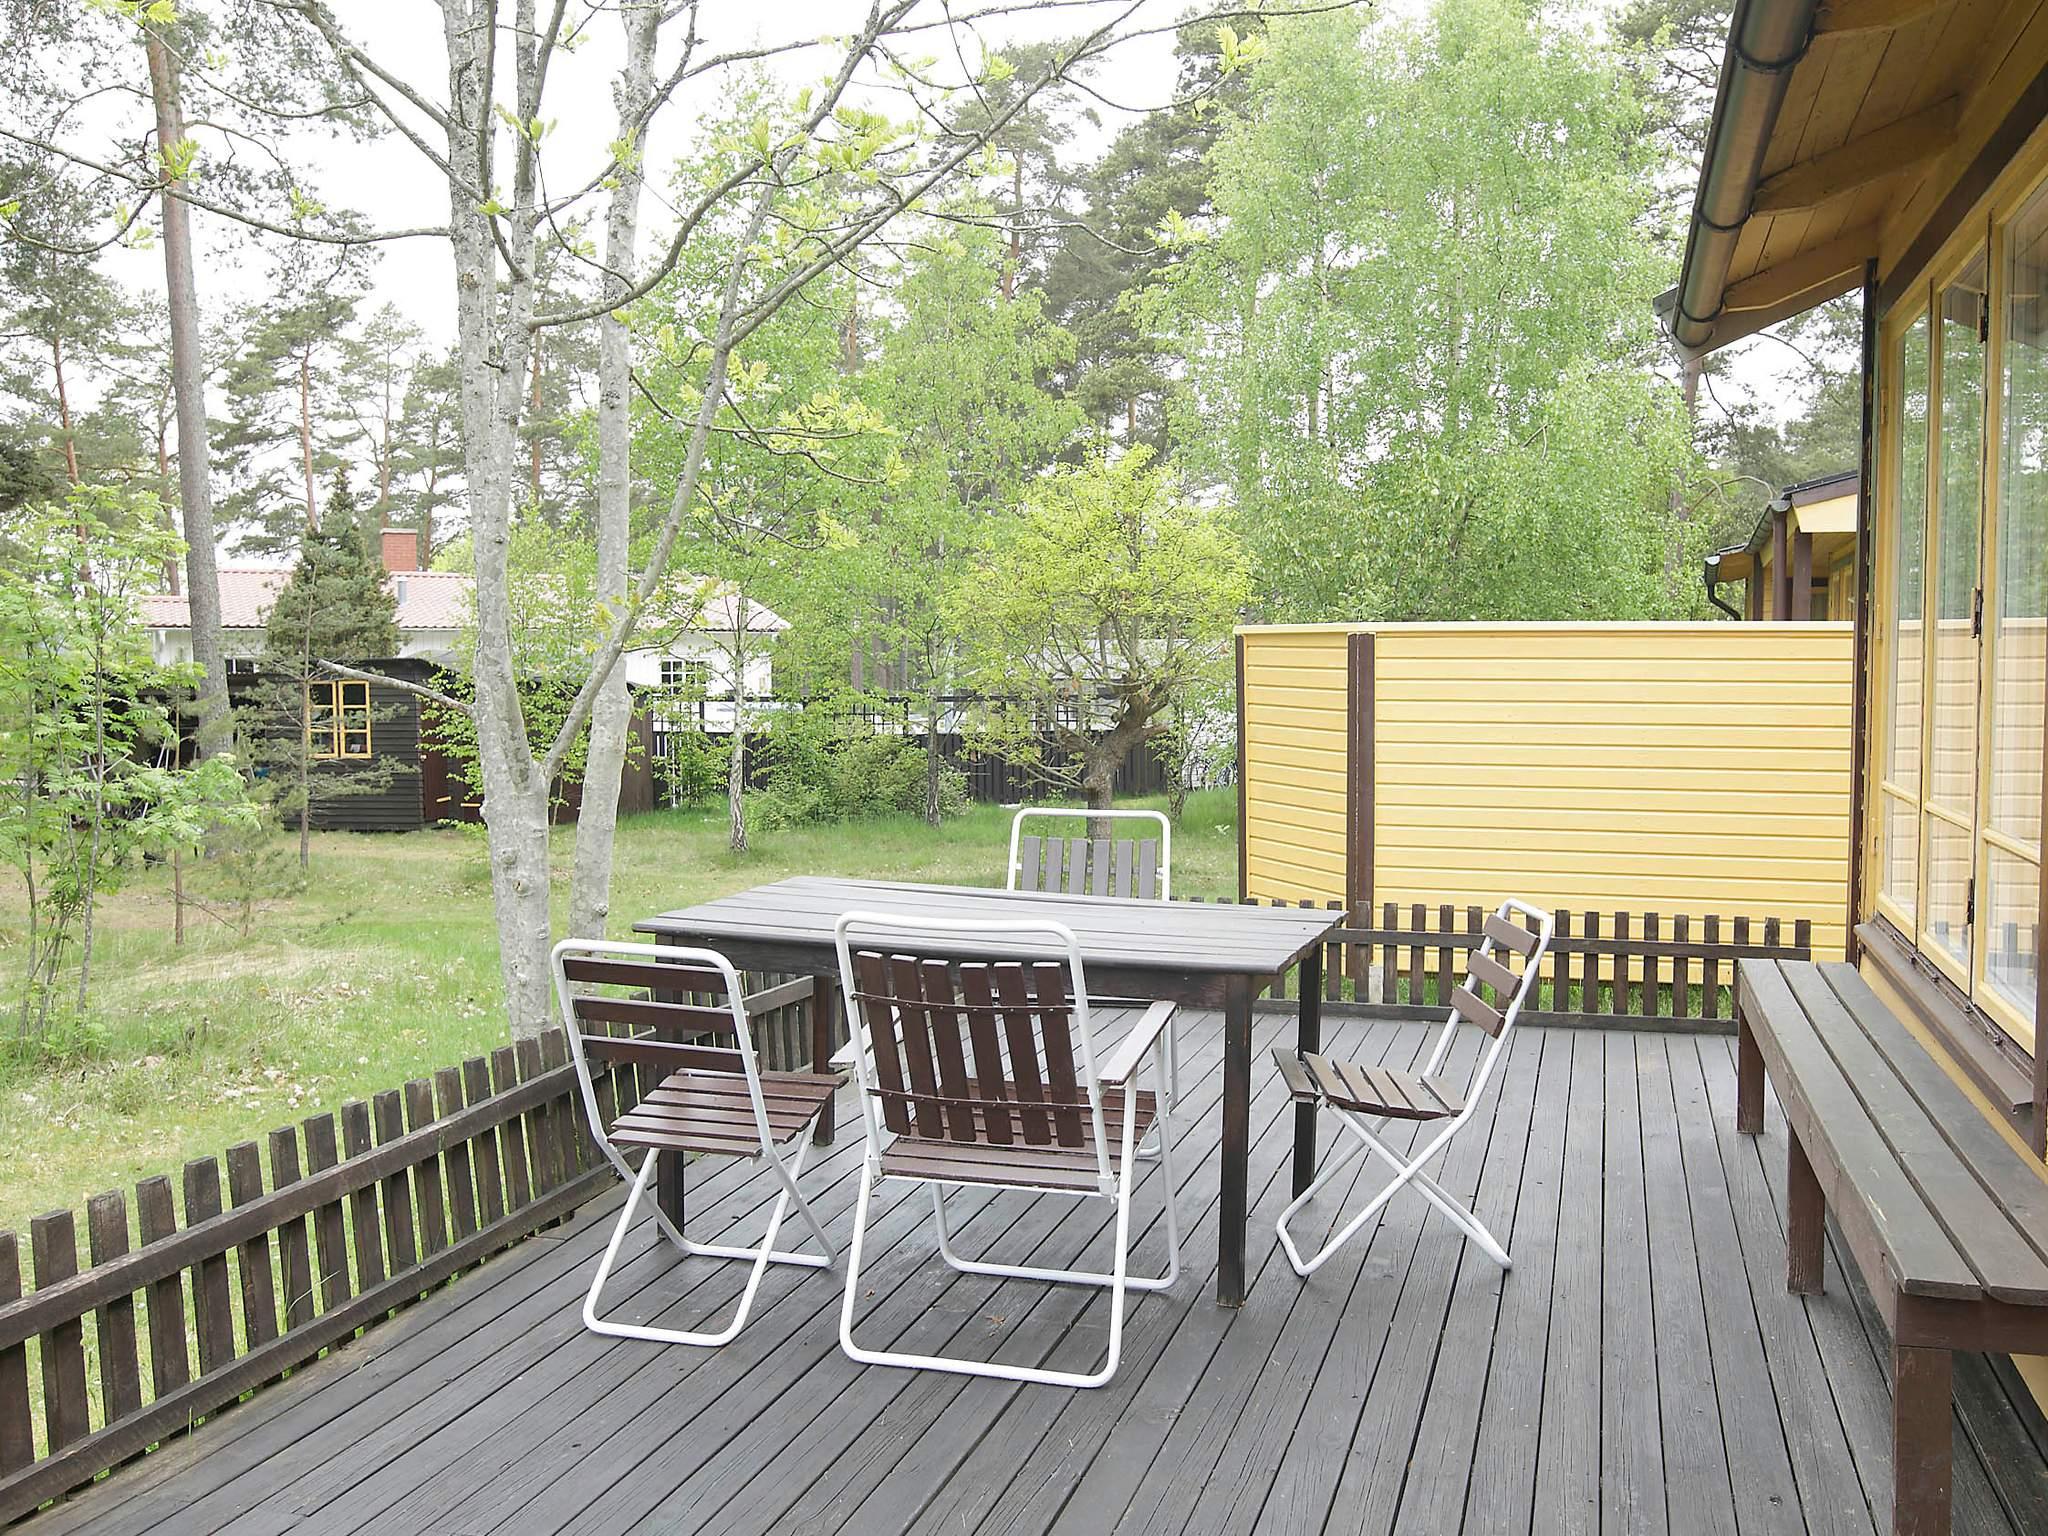 Ferienhaus Oknö (84699), Oknö, Kalmar län, Südschweden, Schweden, Bild 7